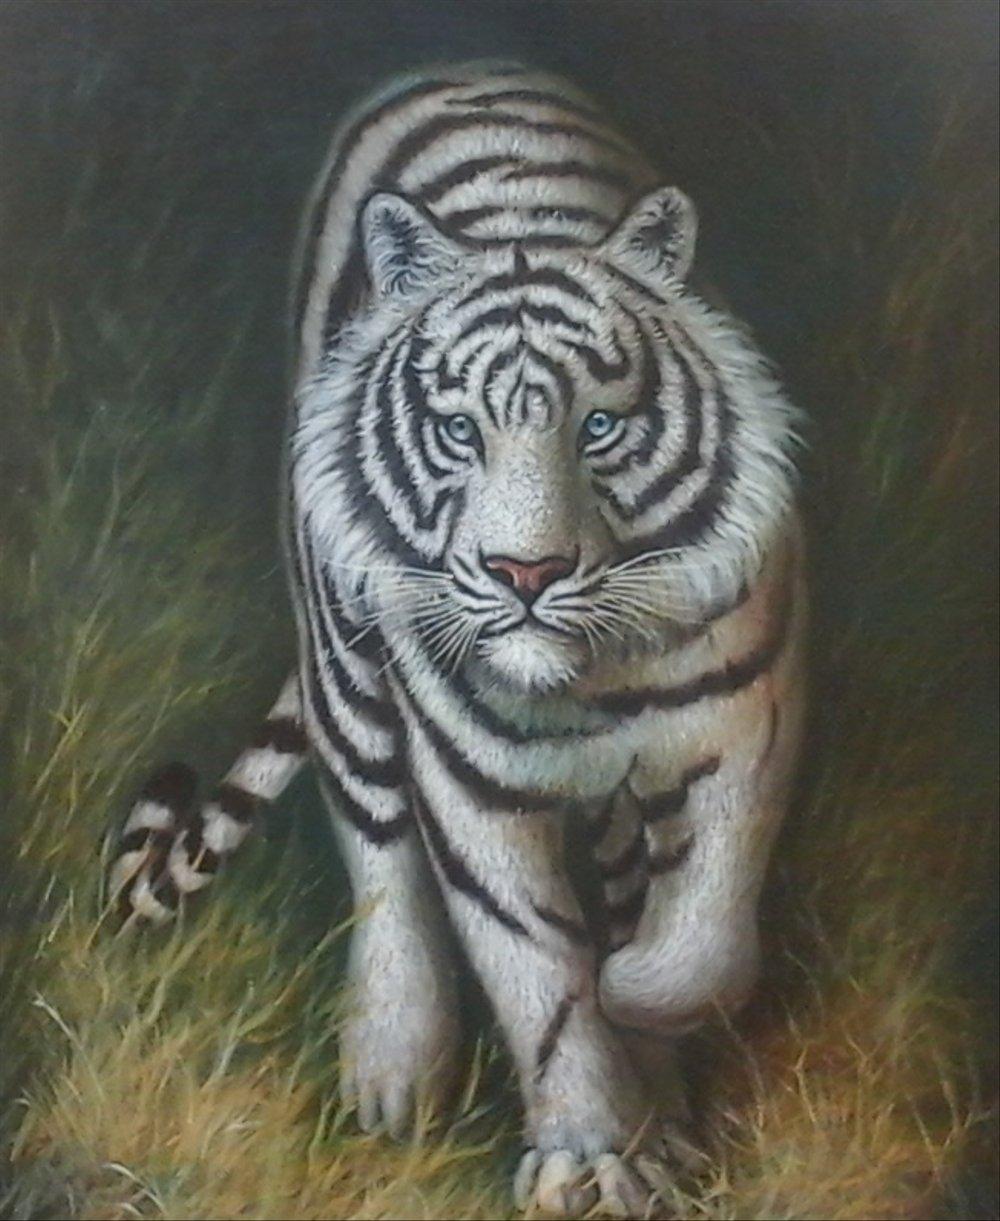 Gambar Harimau Putih : gambar, harimau, putih, Lukisan, Harimau, Putih, 1000x1221, Wallpaper, Teahub.io